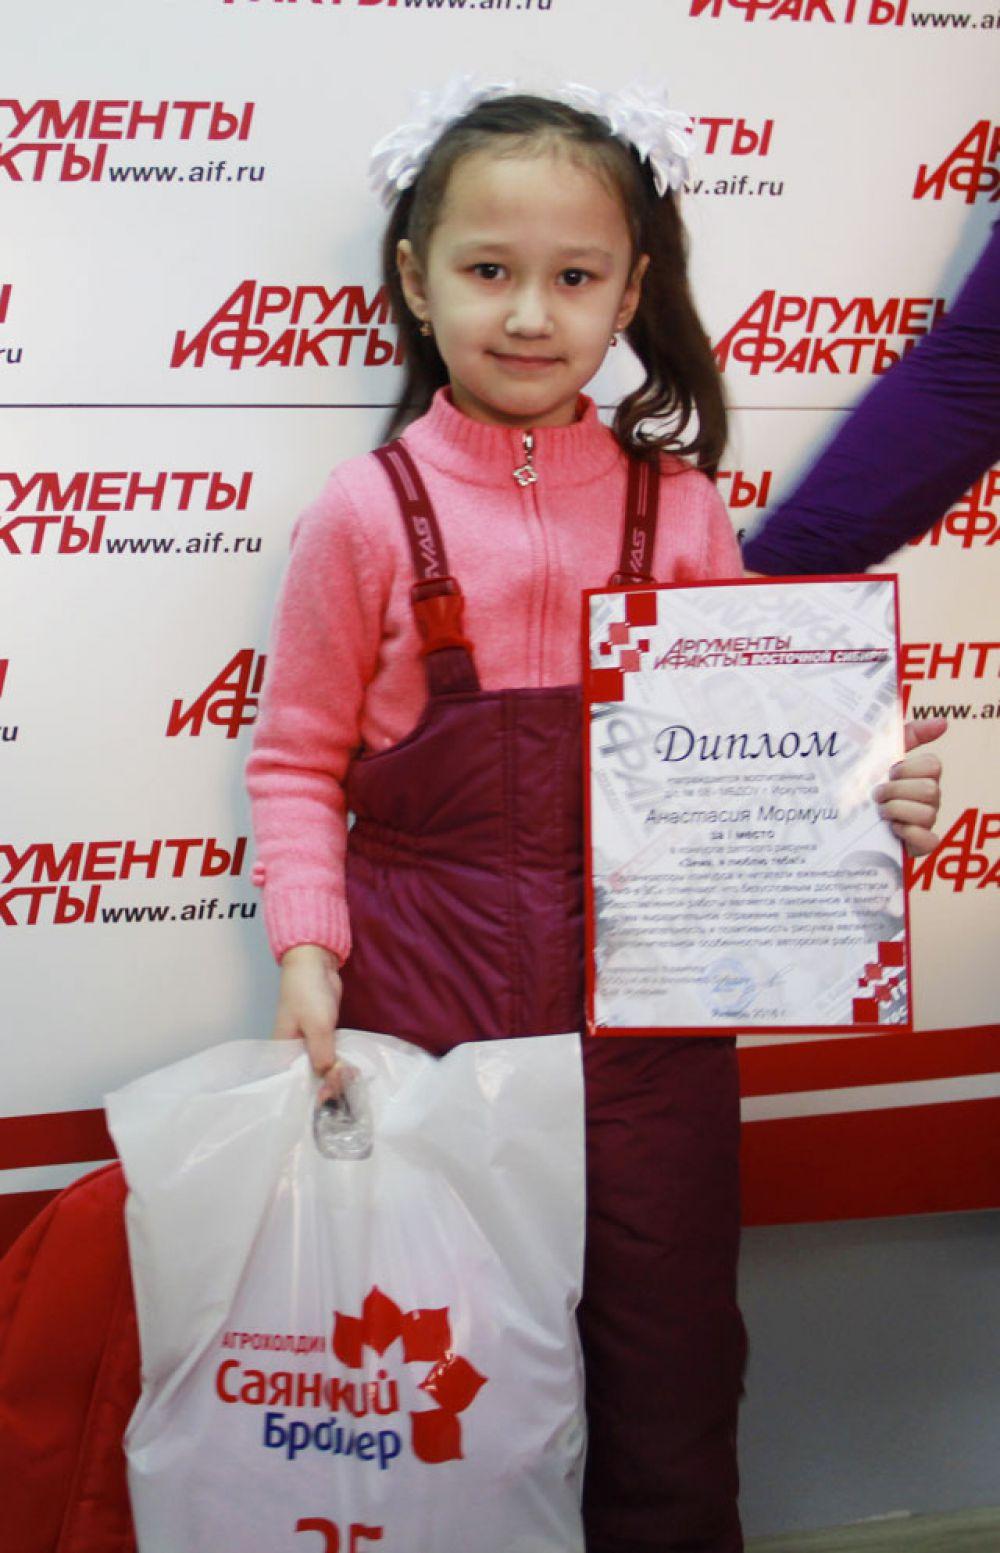 Настя Мормуш - 1 место.